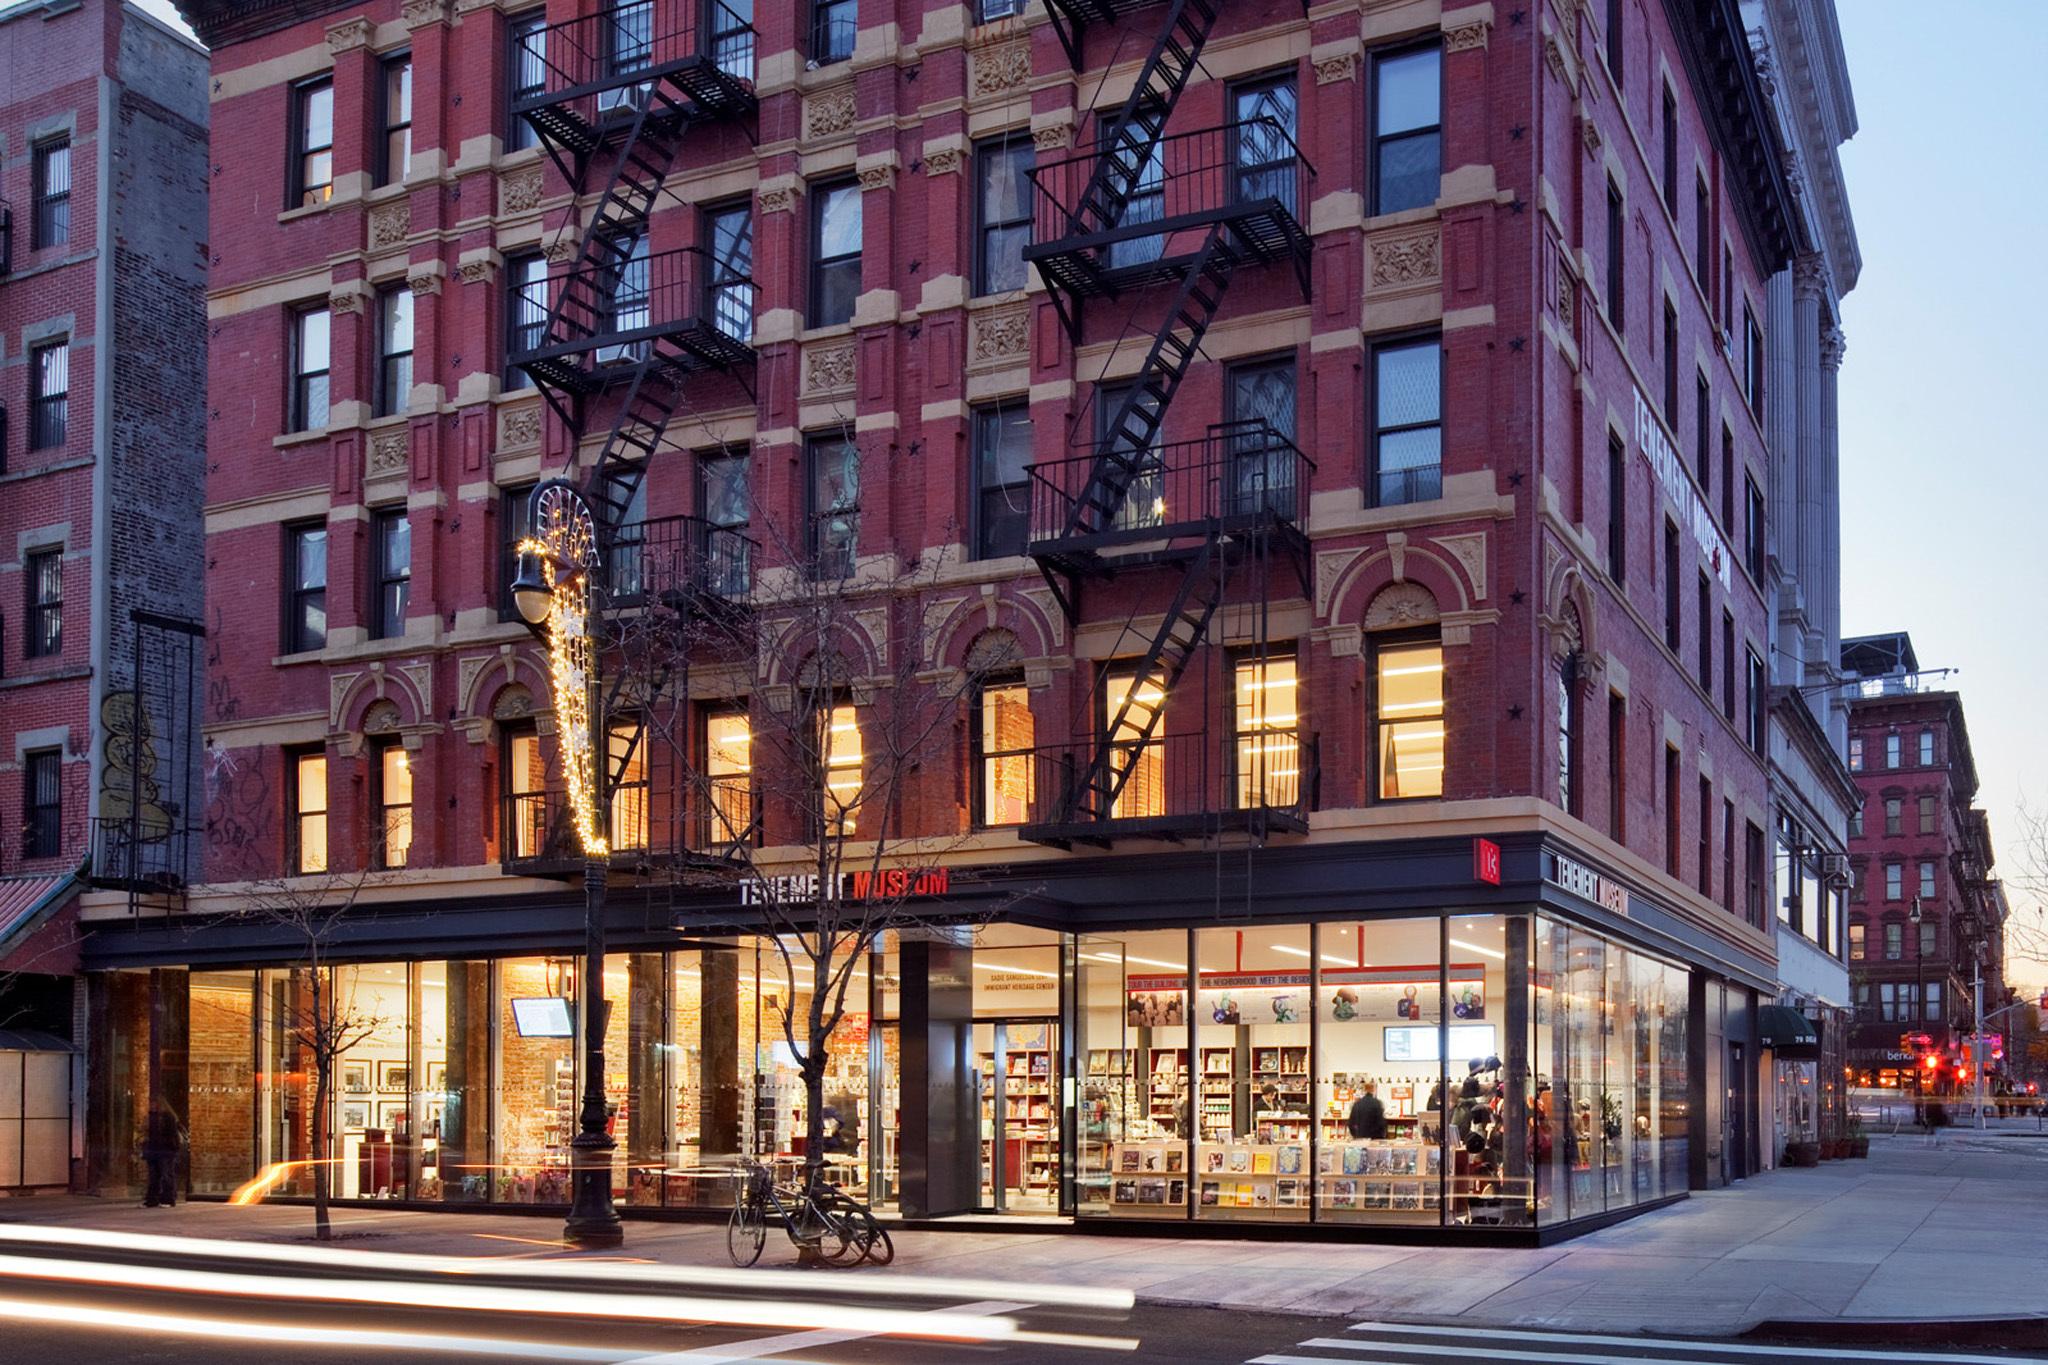 Lower East Side Tenement Museum Shop